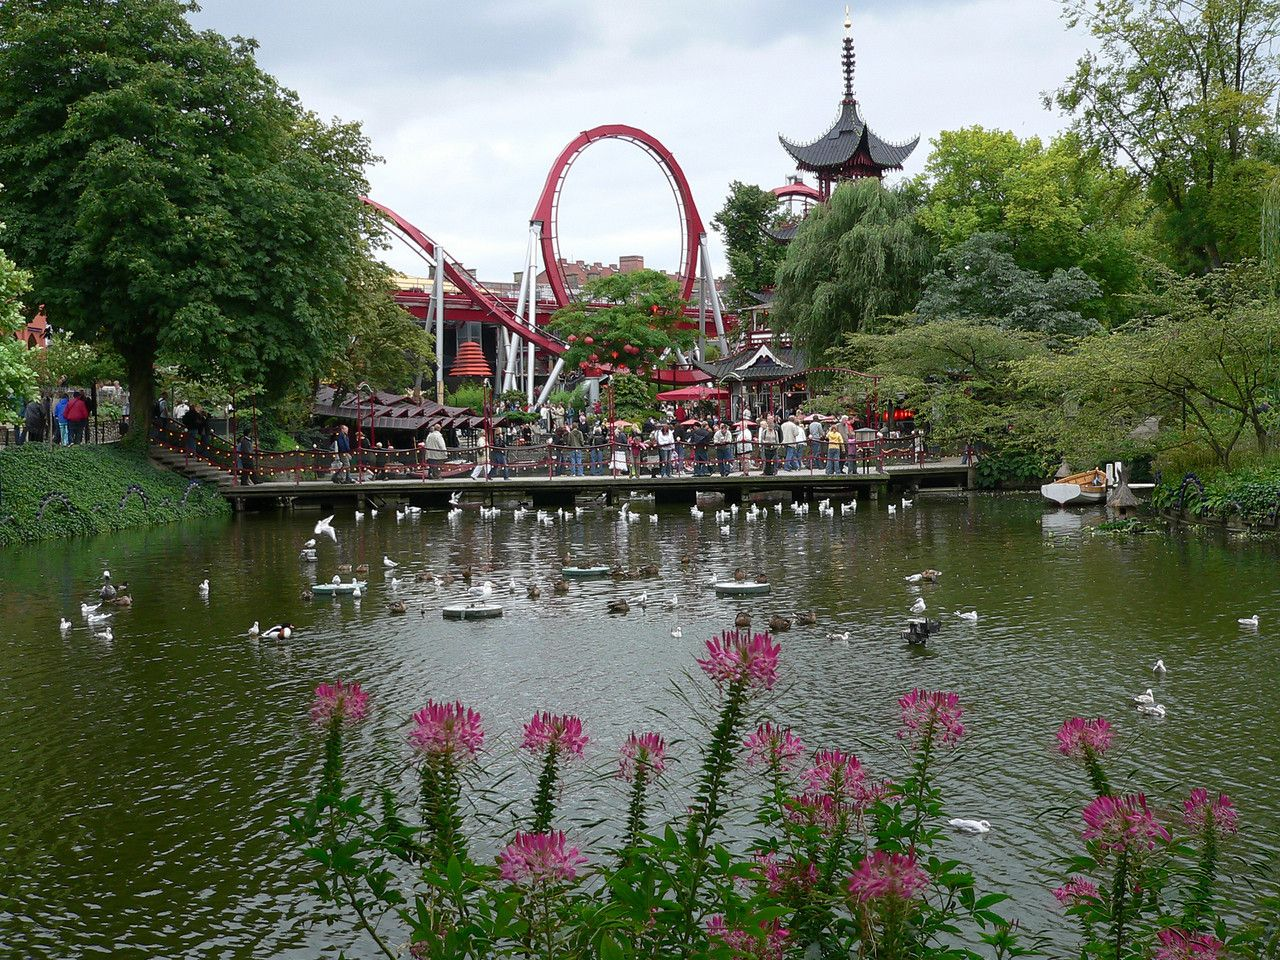 33572e88b5b844126a332d207457b7f7 - What Is Tivoli Gardens Like Today